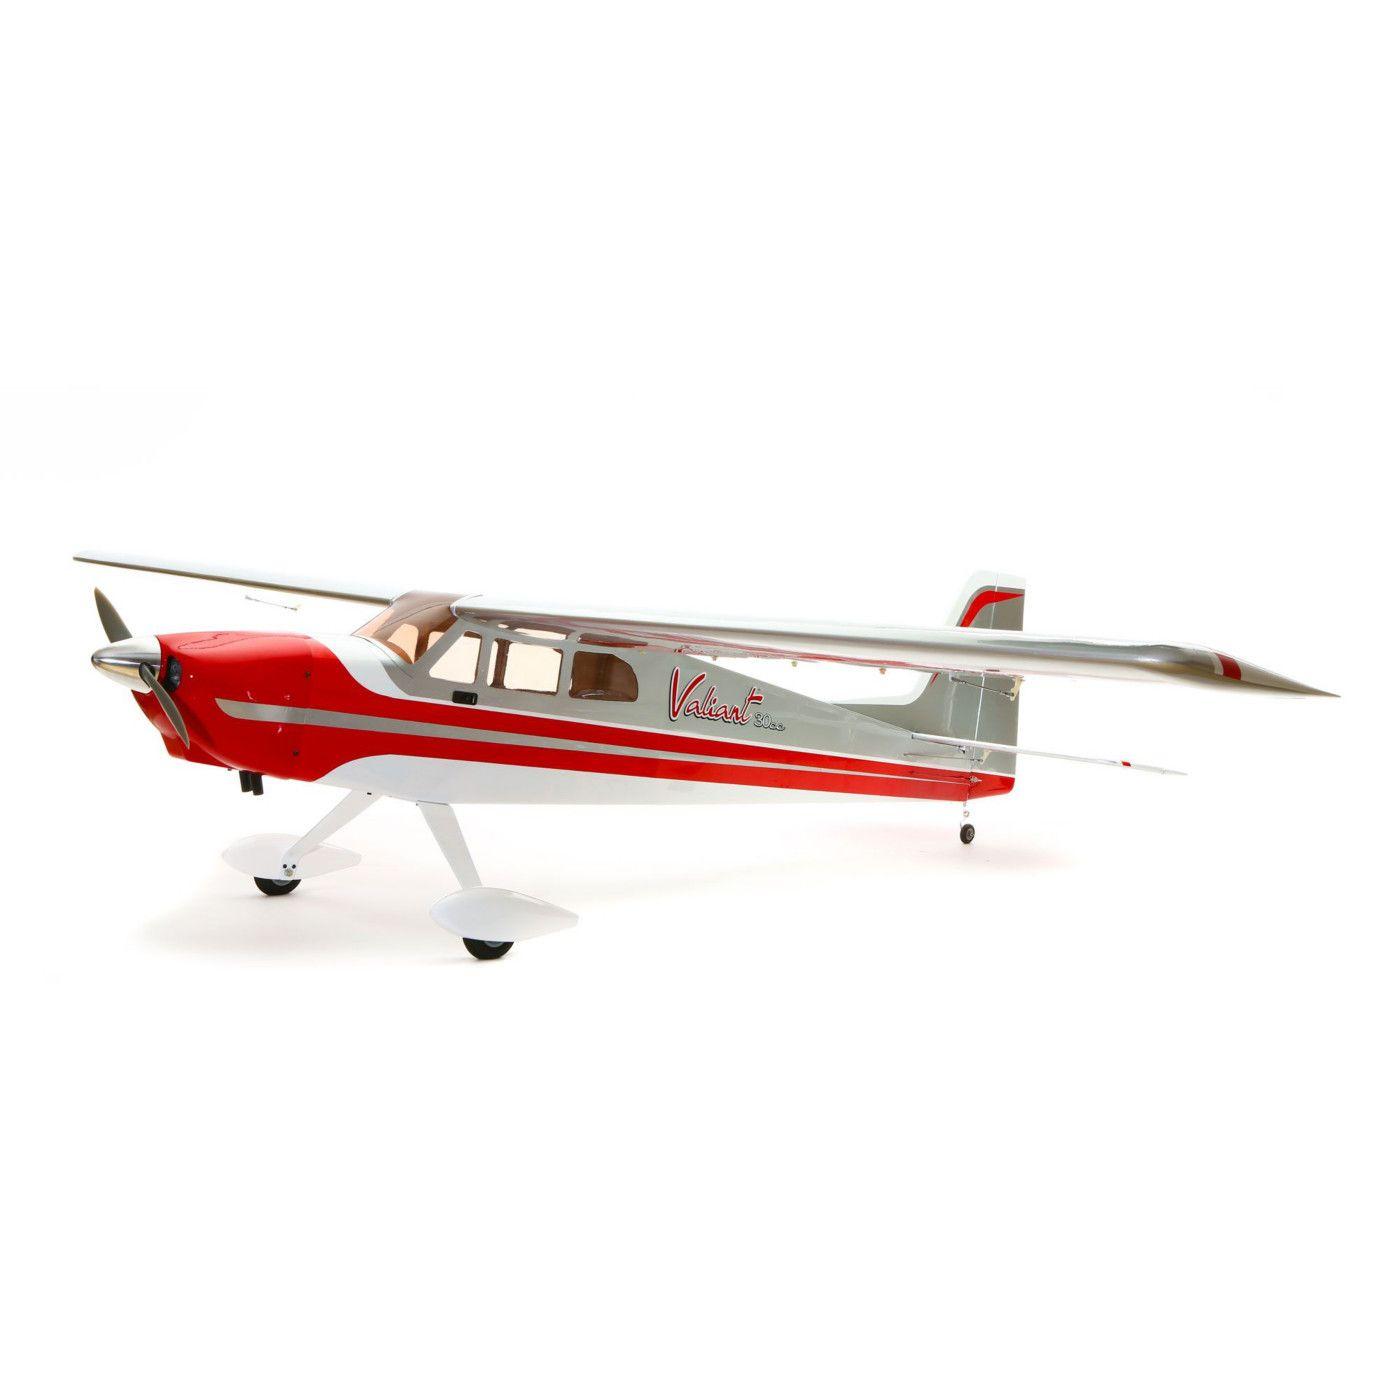 Valiant 30cc hangar 9